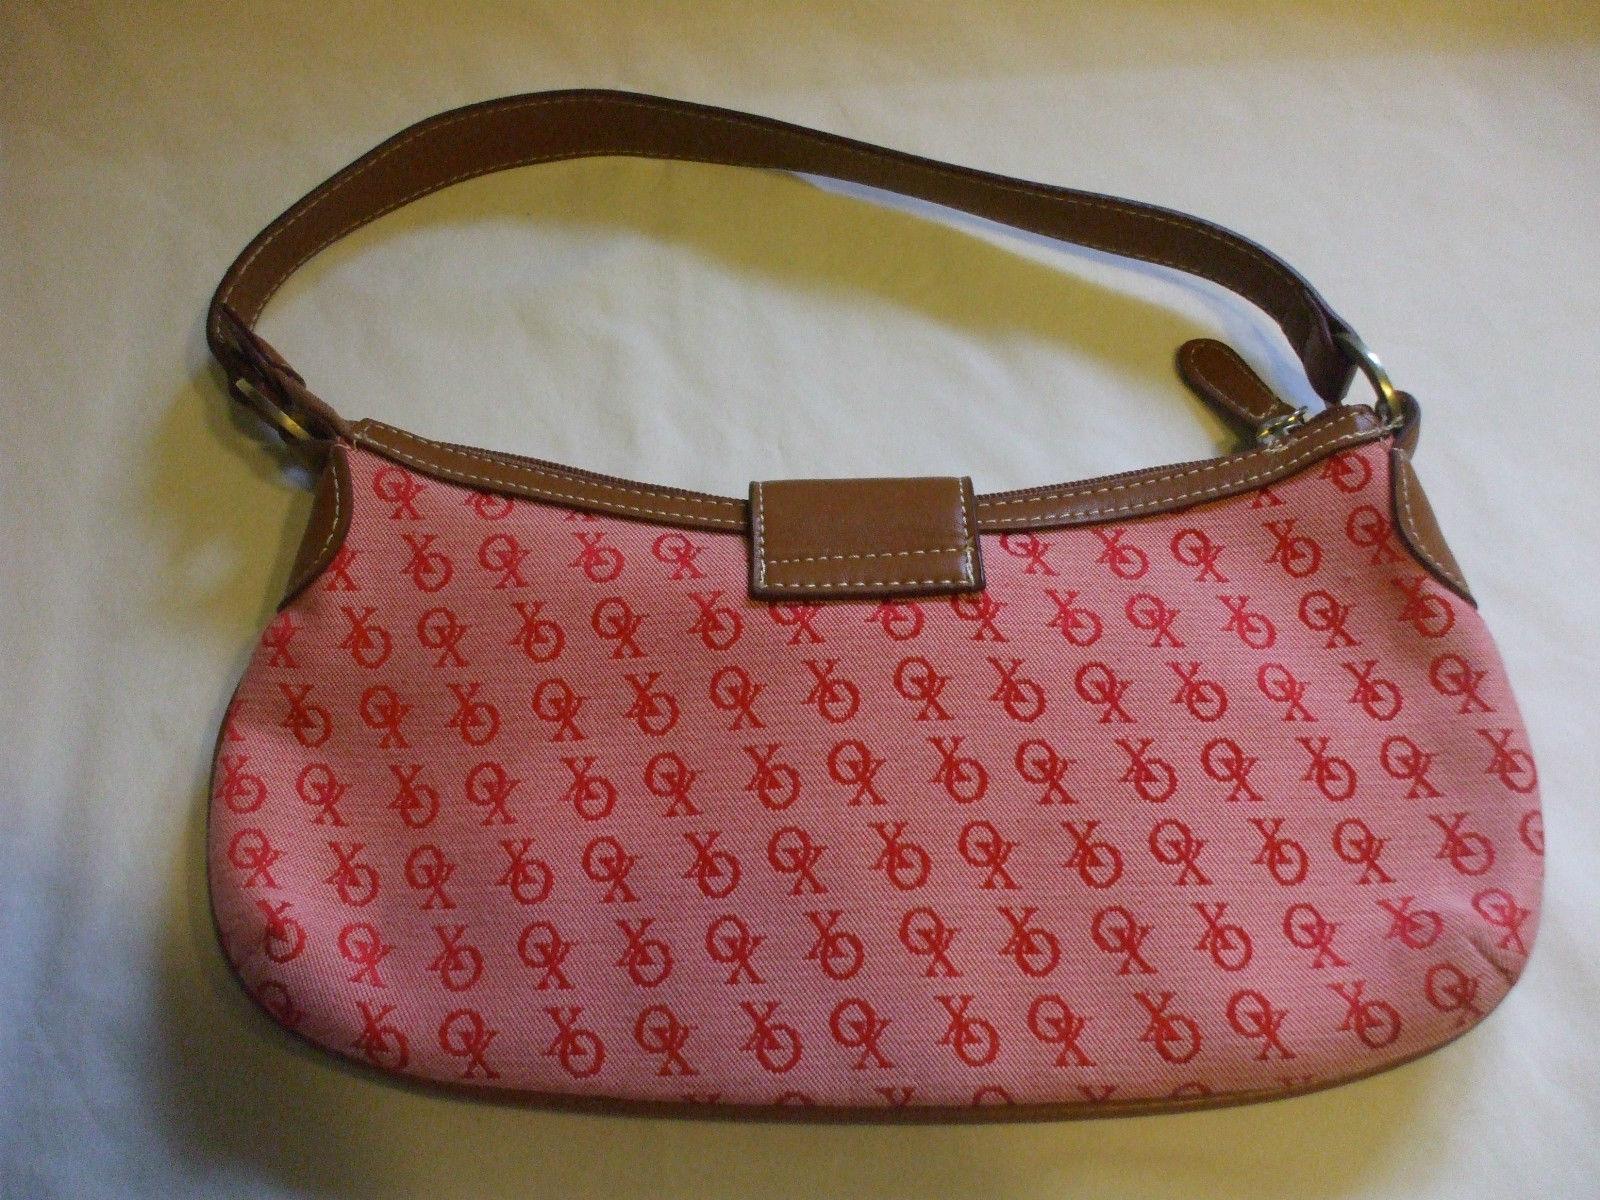 XOXO Red Nylon Purse Handbag With Brown Leather Strap